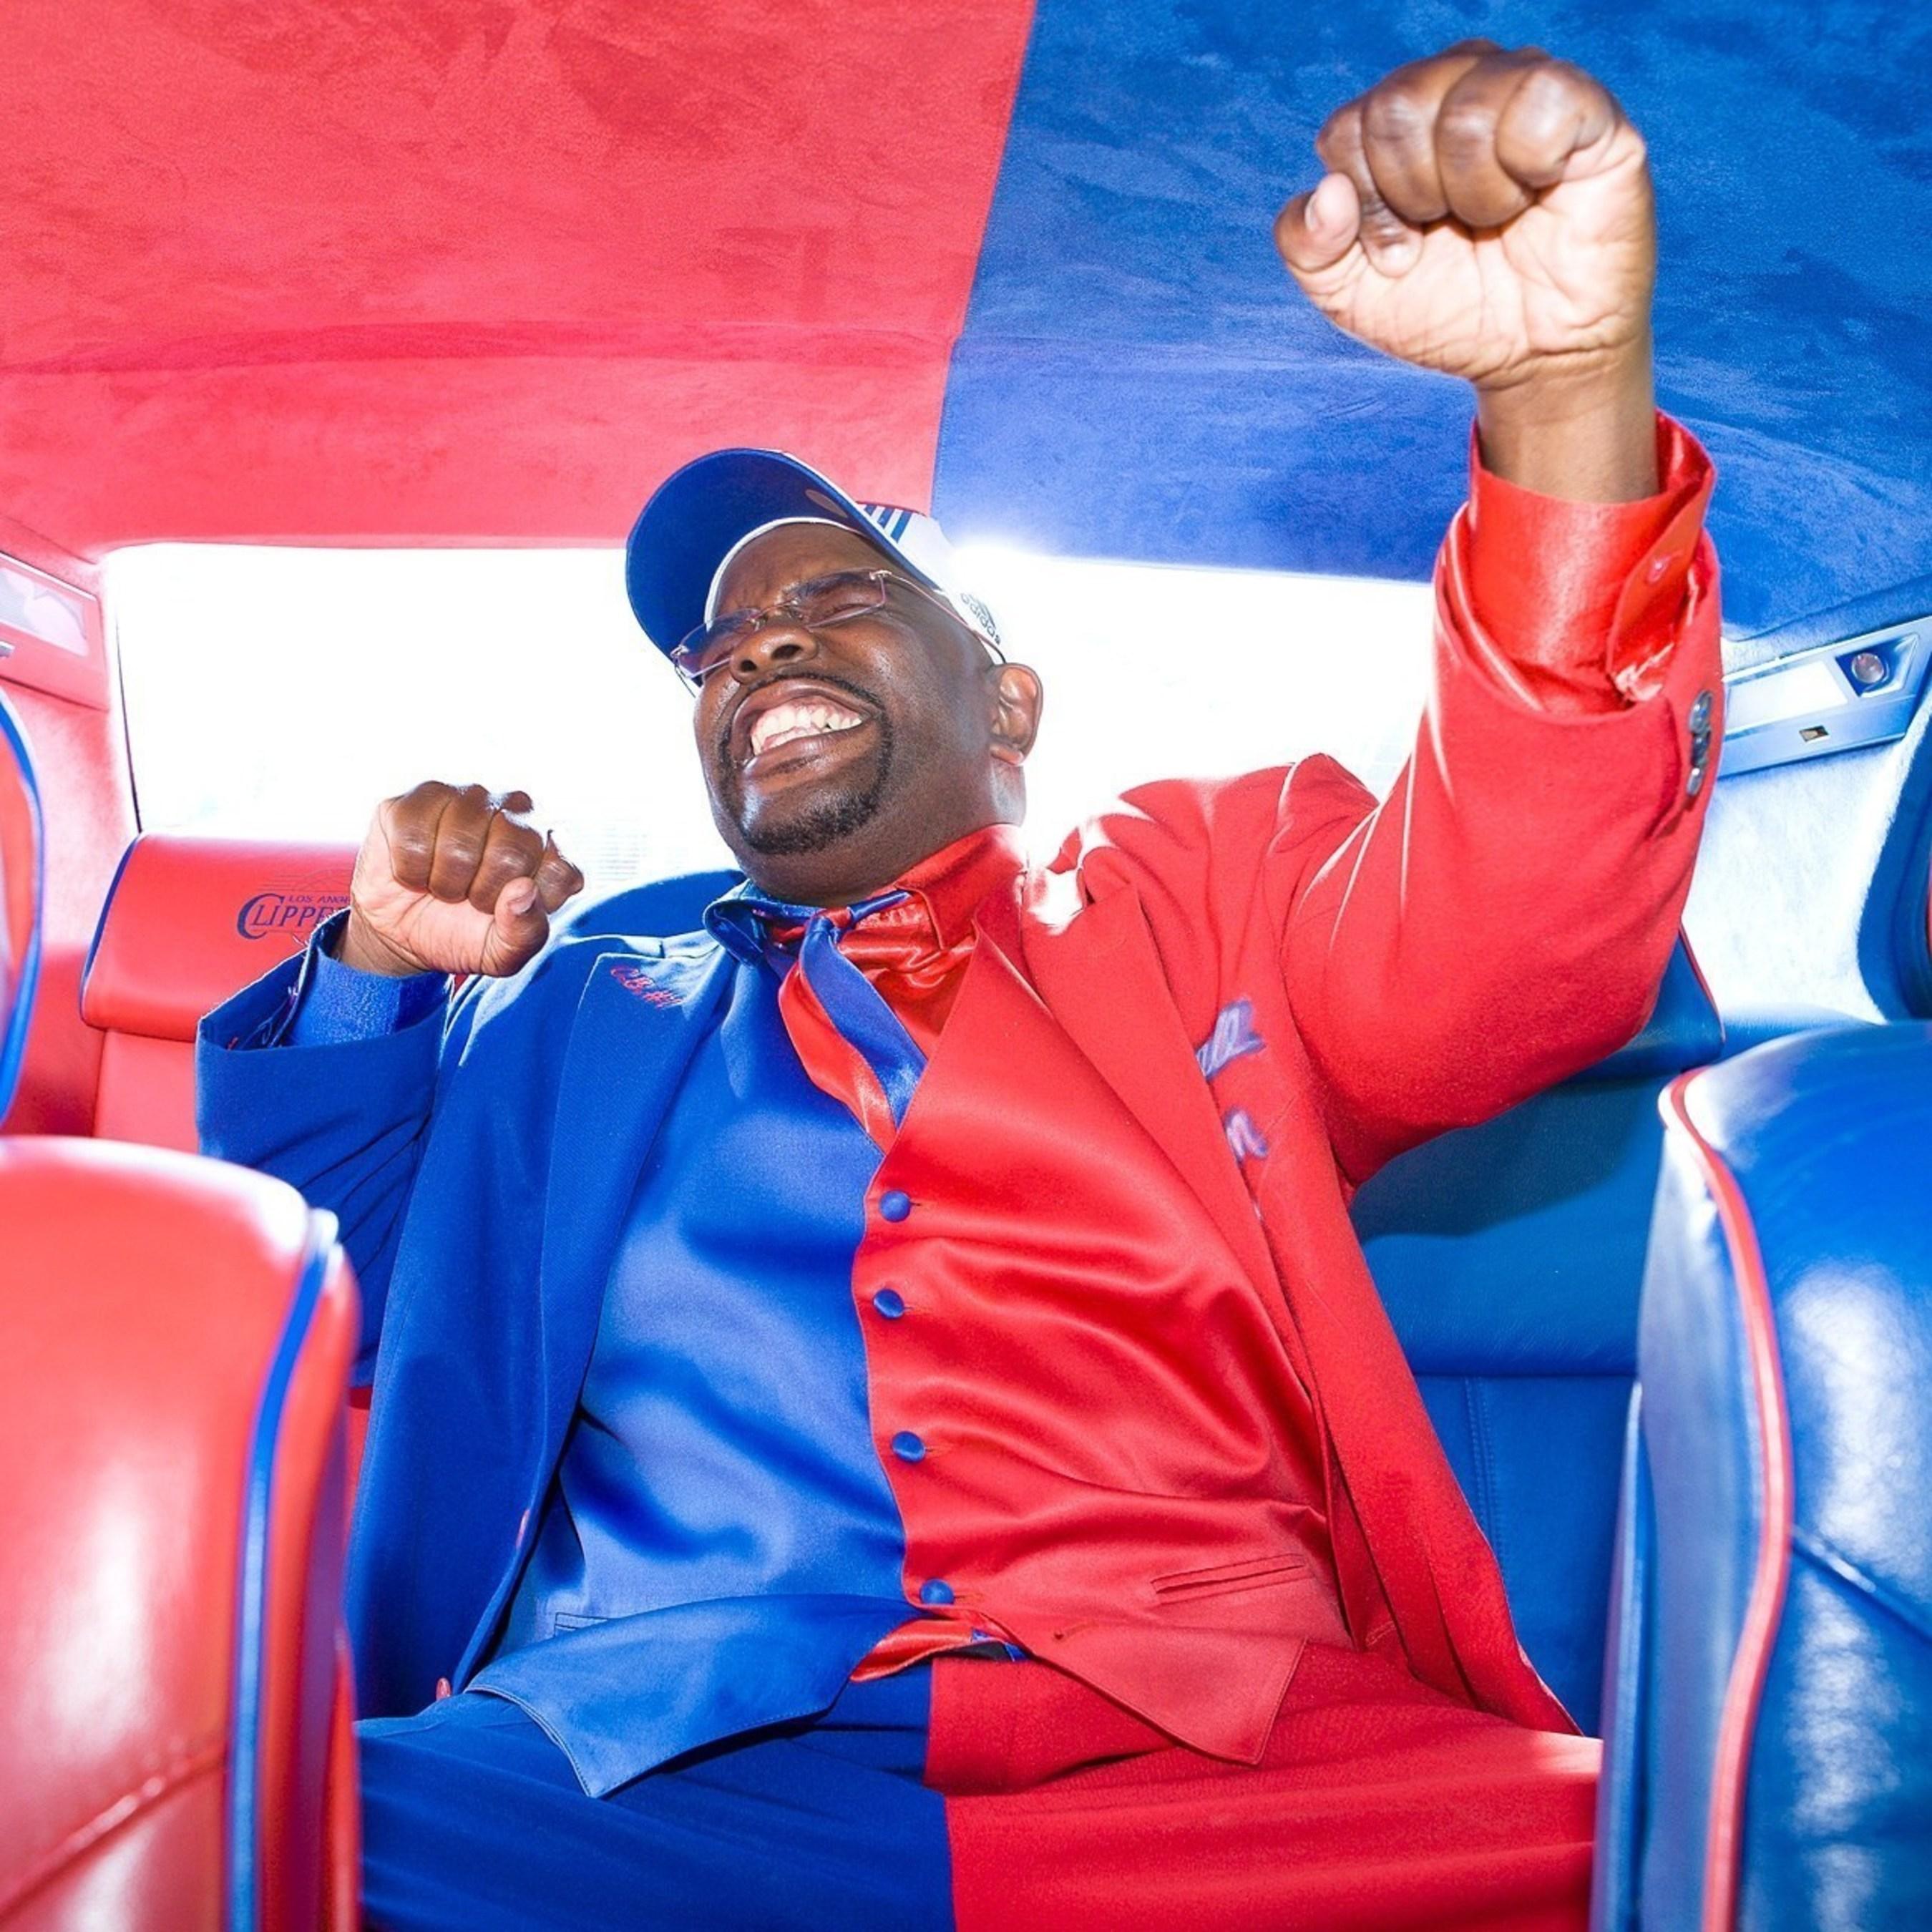 #1 Los Angeles Clippers Super Fan - Clipper Darrell.